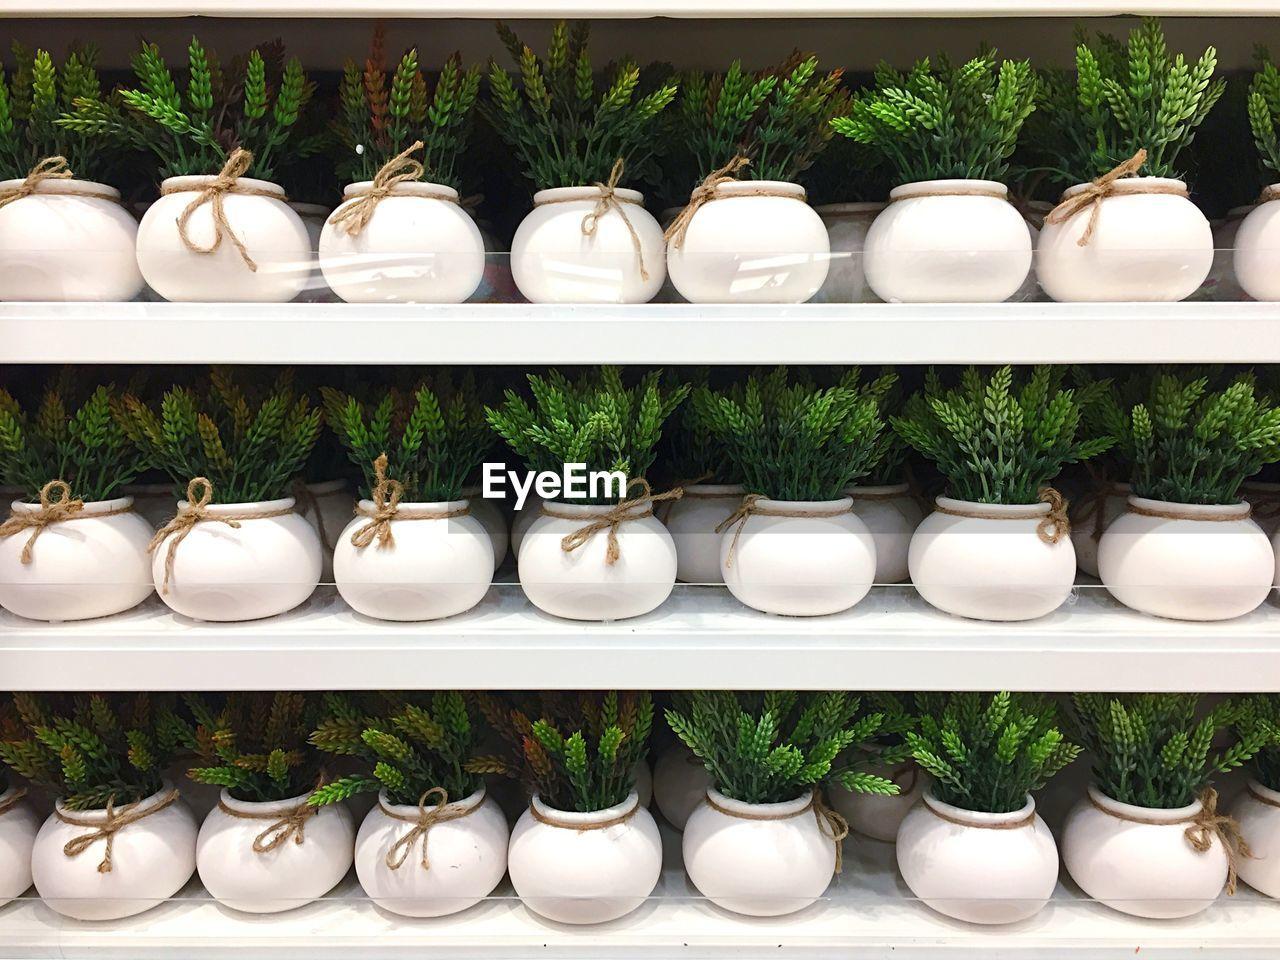 Artificial plants in shelves